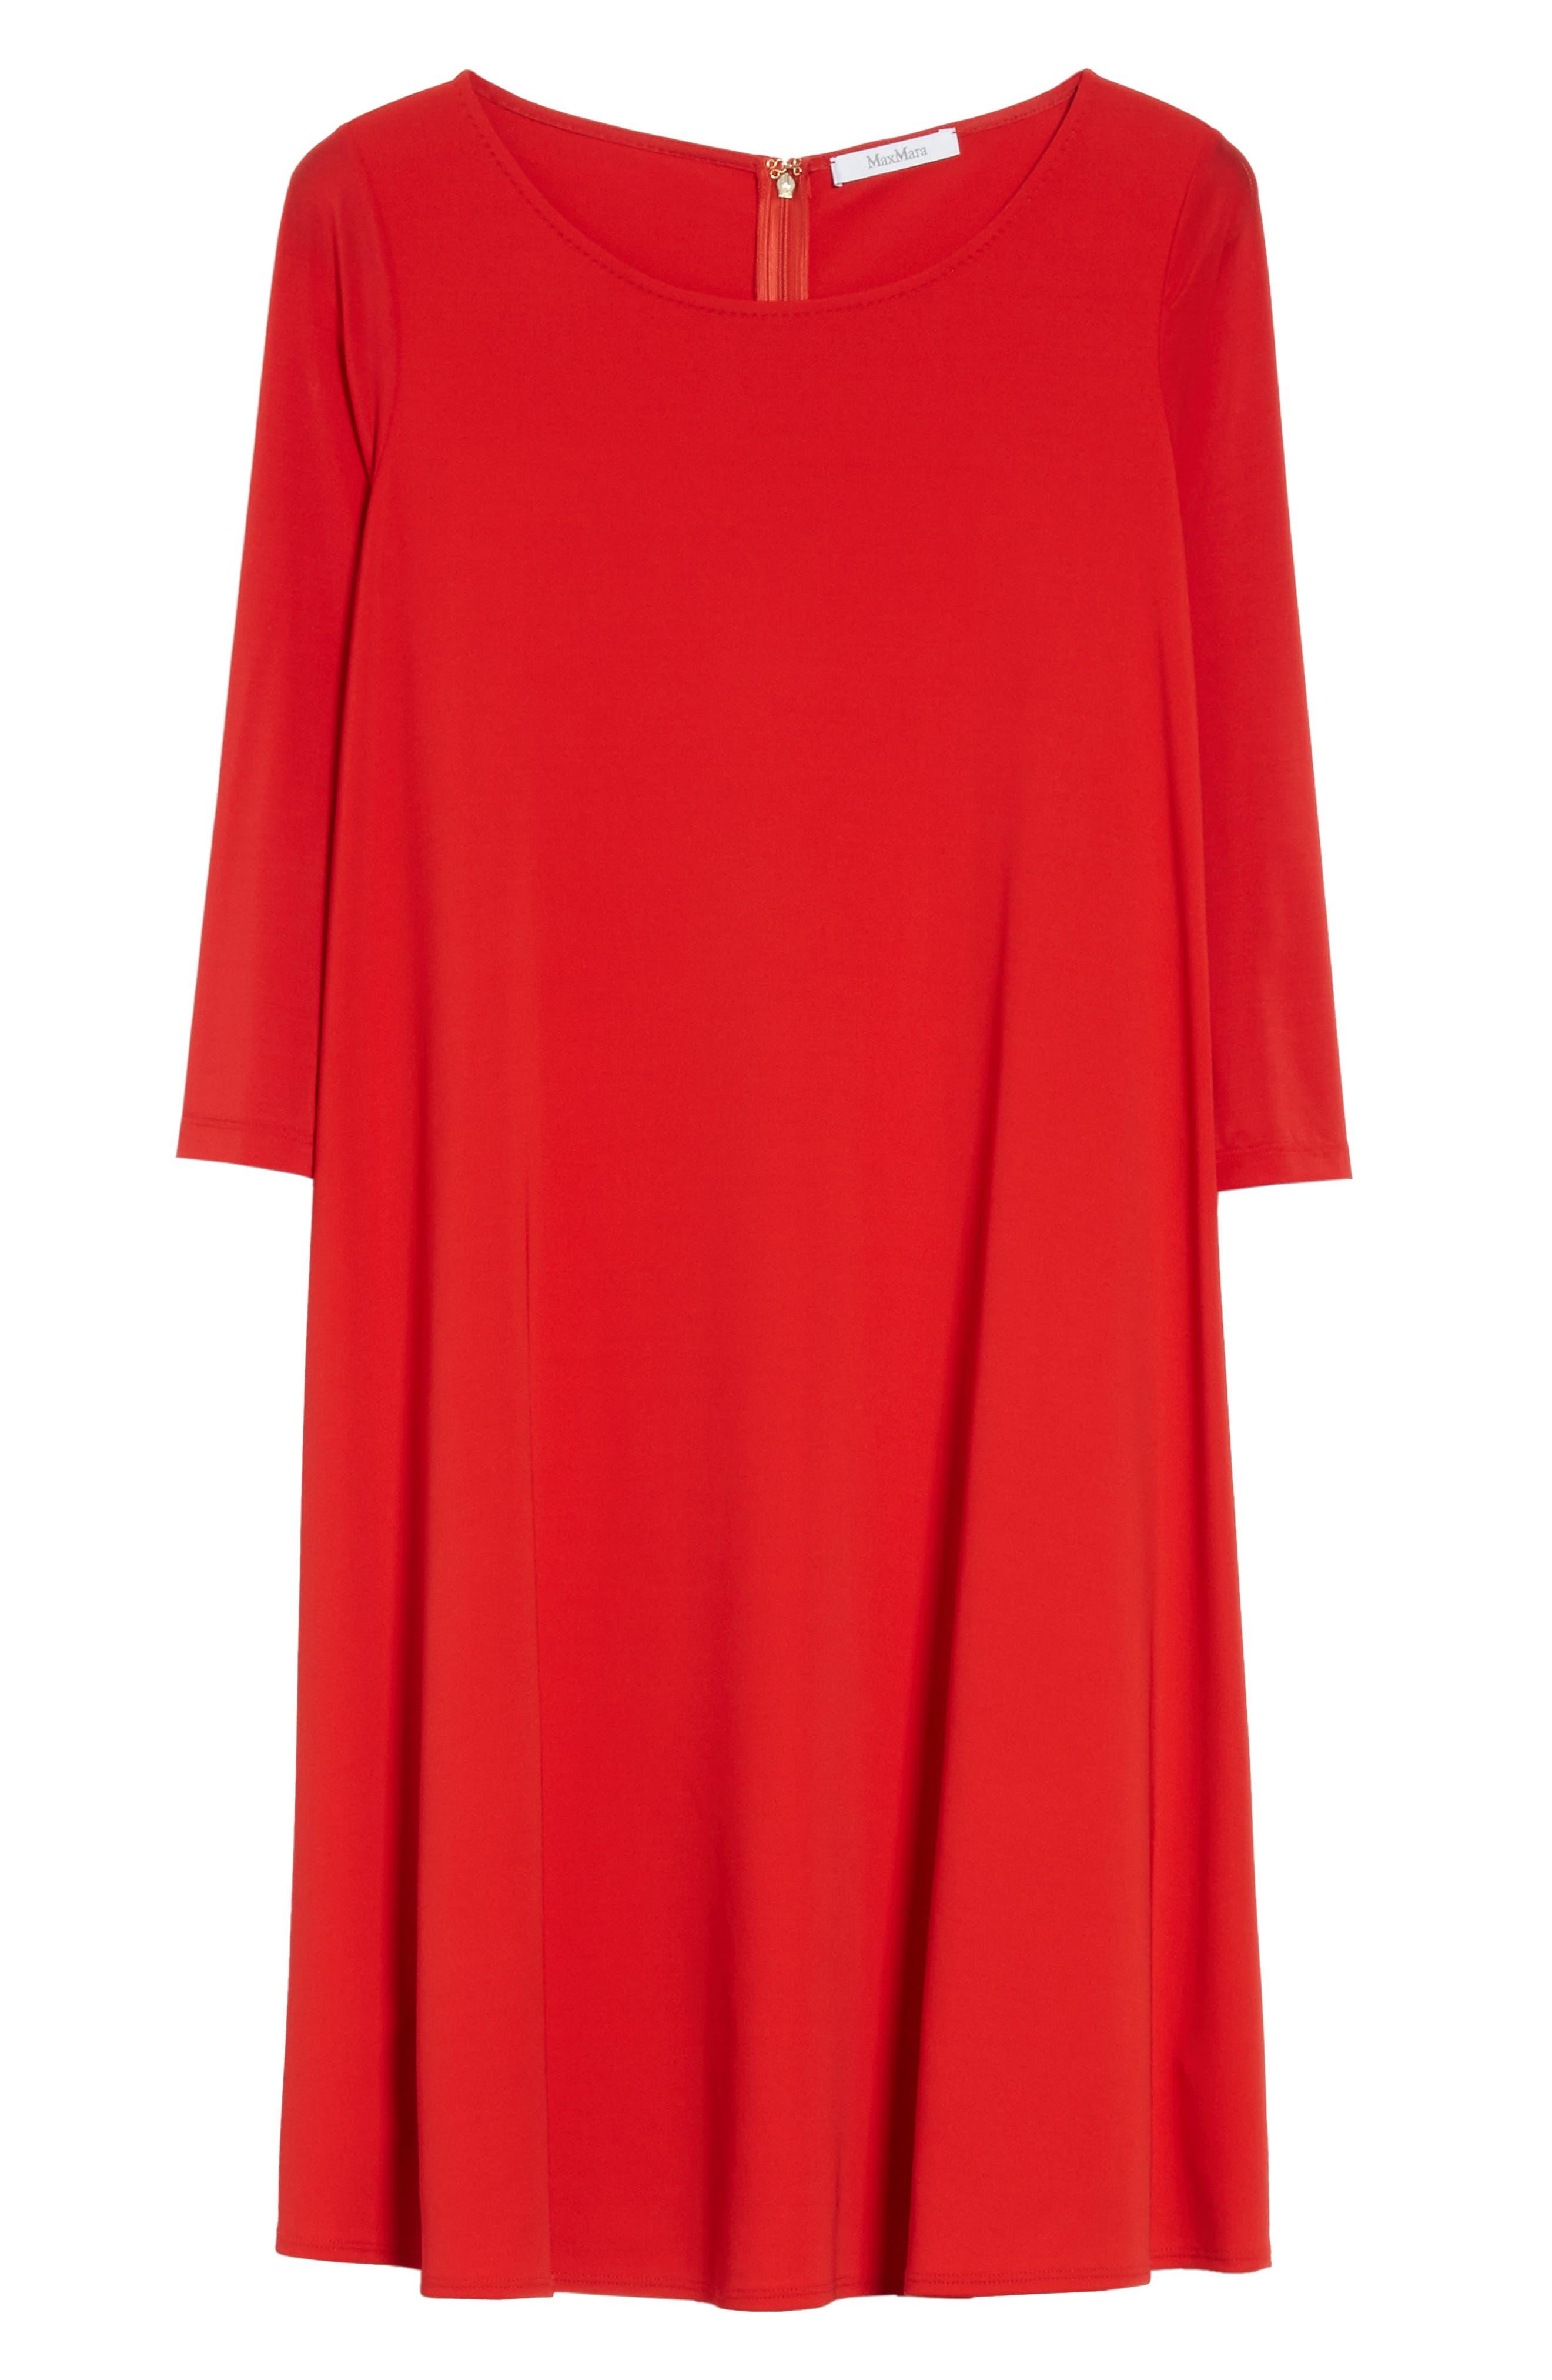 Pigna Swing Dress,                             Alternate thumbnail 6, color,                             Red